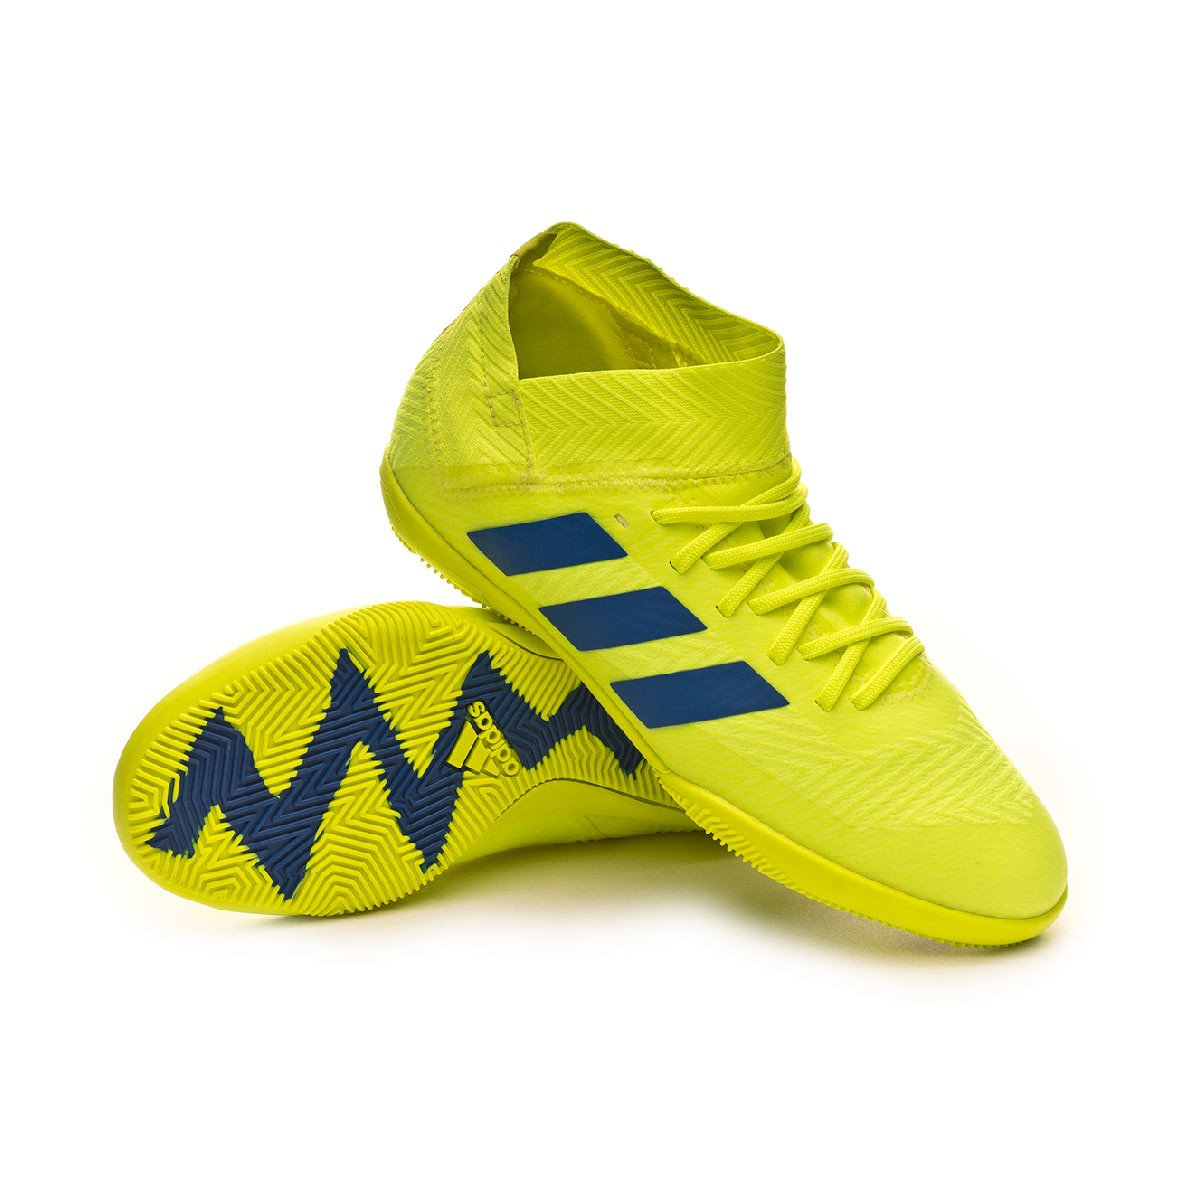 1b38fcea2db55 Futsal Boot adidas Nemeziz Tango 18.3 IN Niño Solar yellow-Football ...